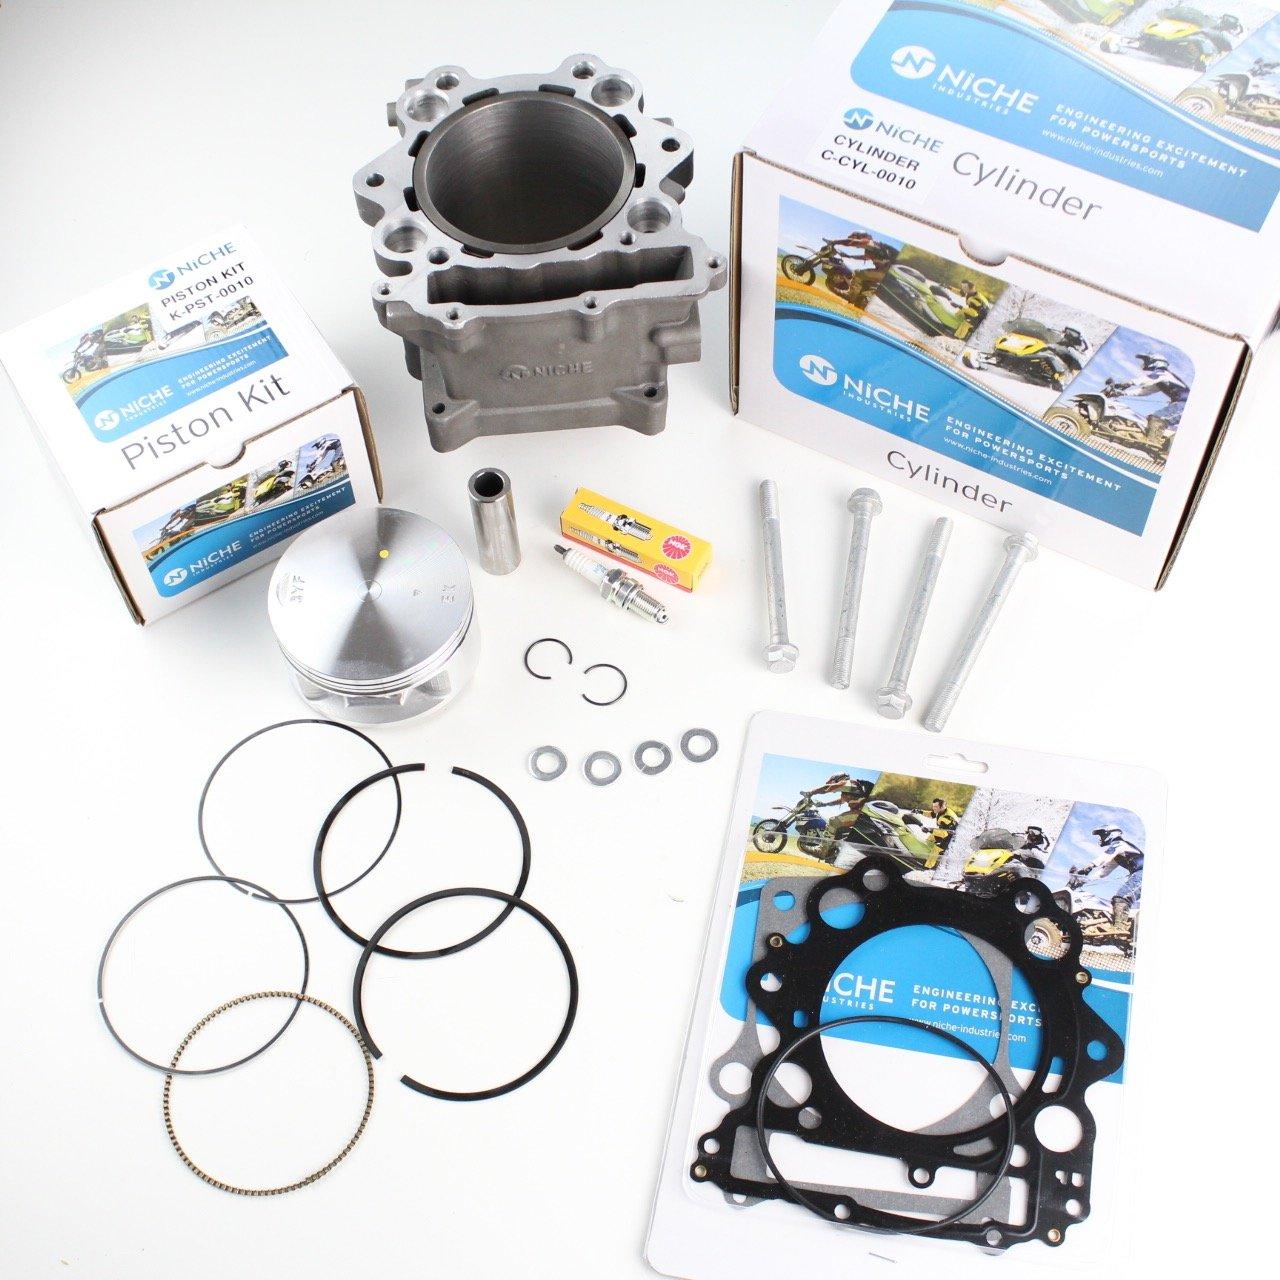 NICHE 686cc 102mm Big Bore Cylinder Piston Gasket Kit for Yamaha Rhino 660 2004-2007 Niche Industries